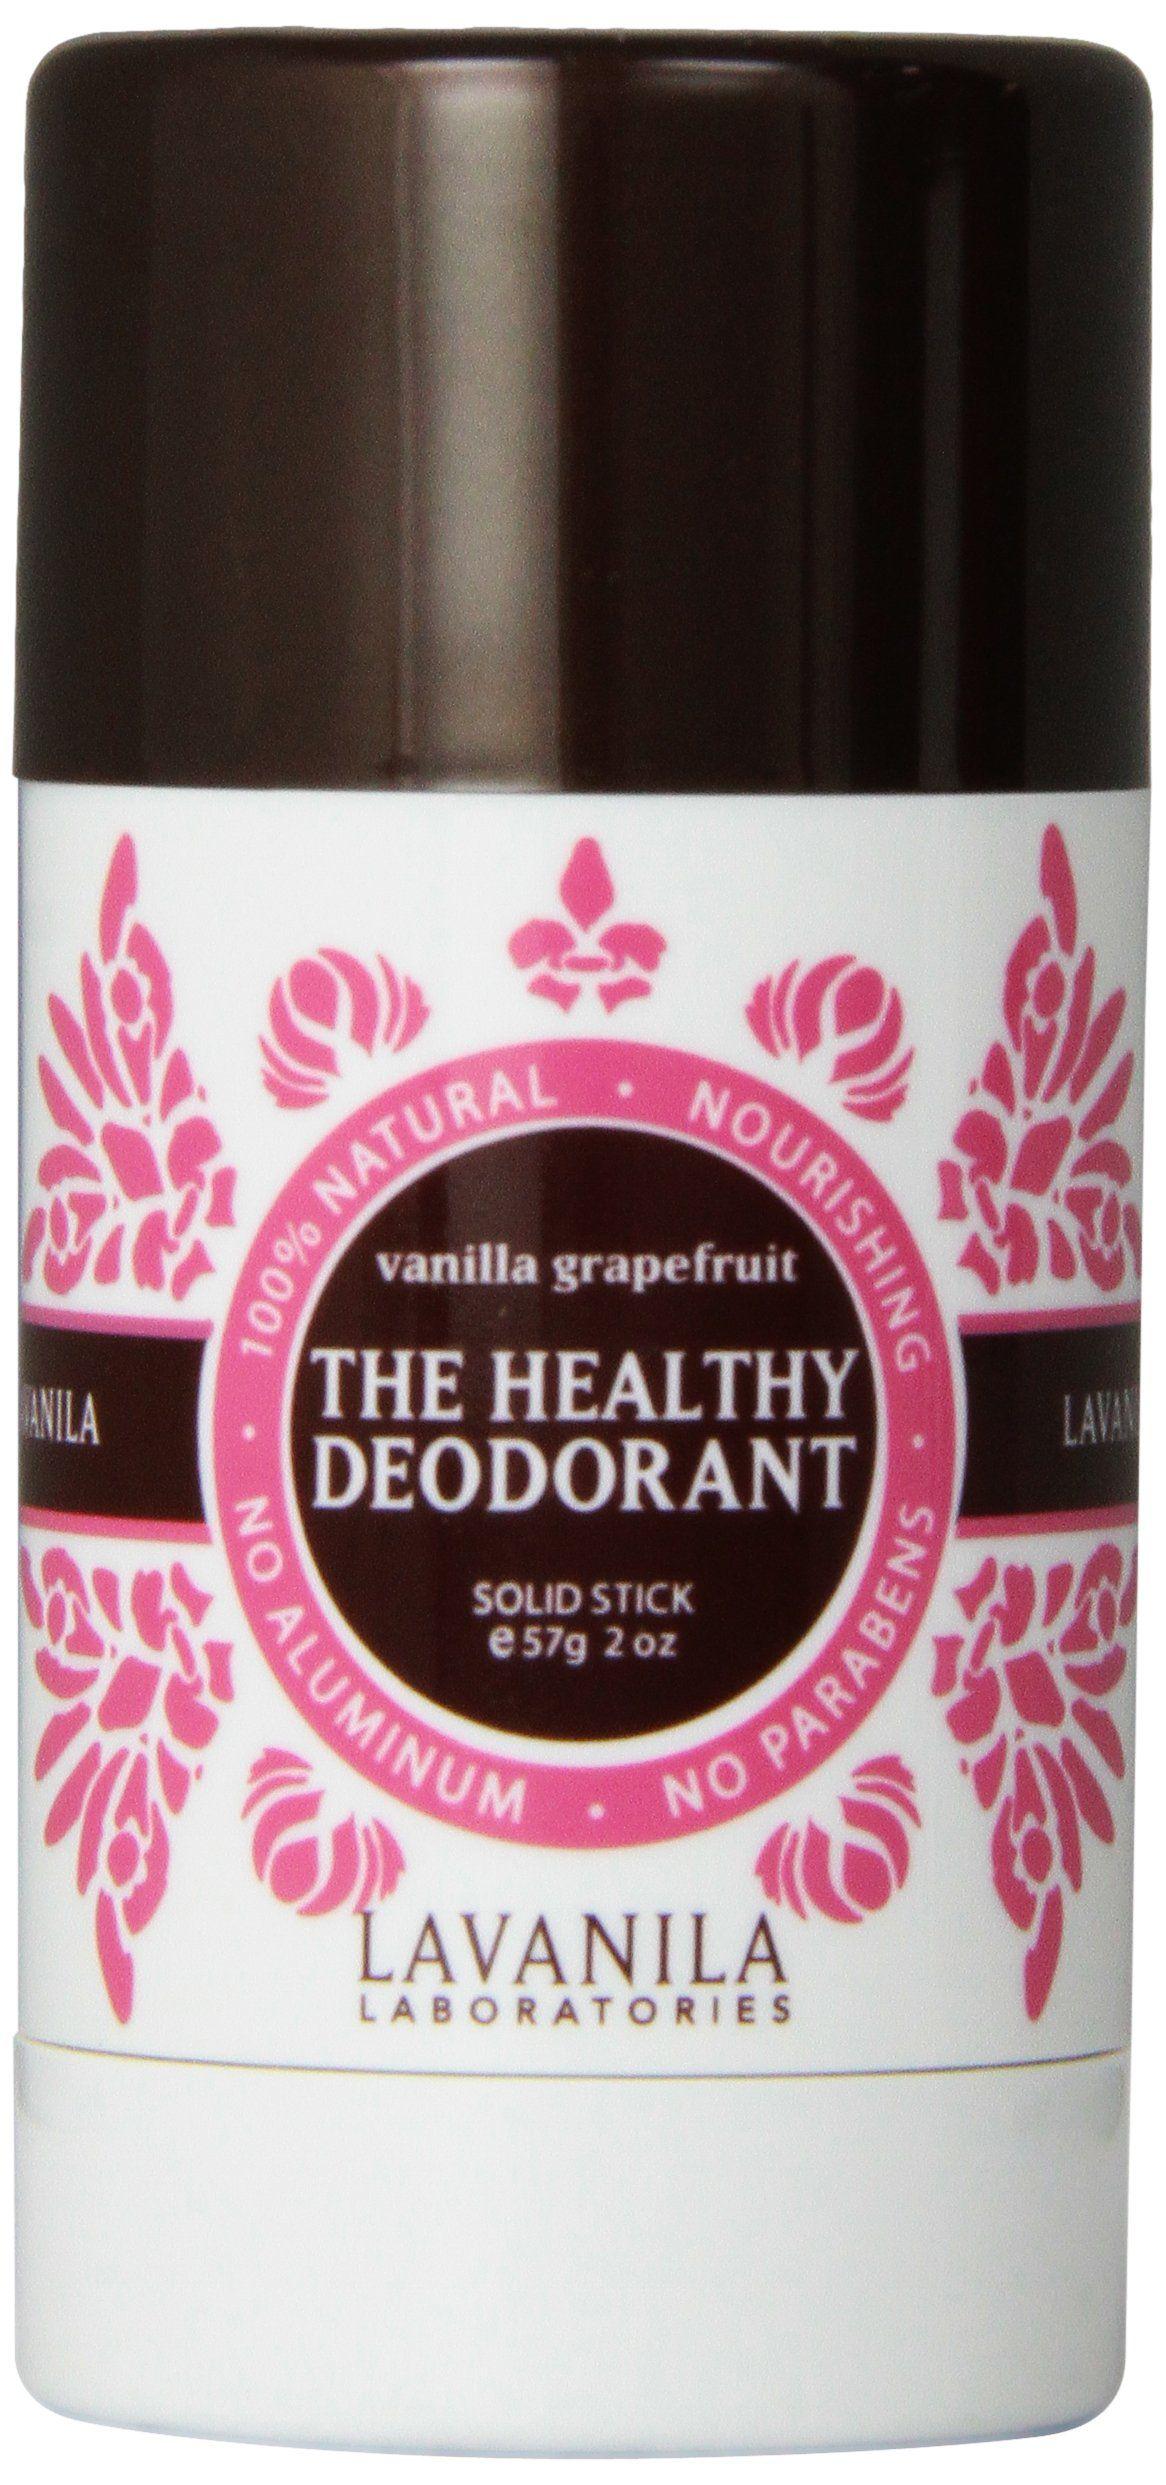 Amazon.com: Lavanila The Healthy Deodorant-Vanilla Grapefruit-1.7 oz.: Health & Personal Care http://forums.huaren.us/showtopic.aspx?topicid=1817390&page=1